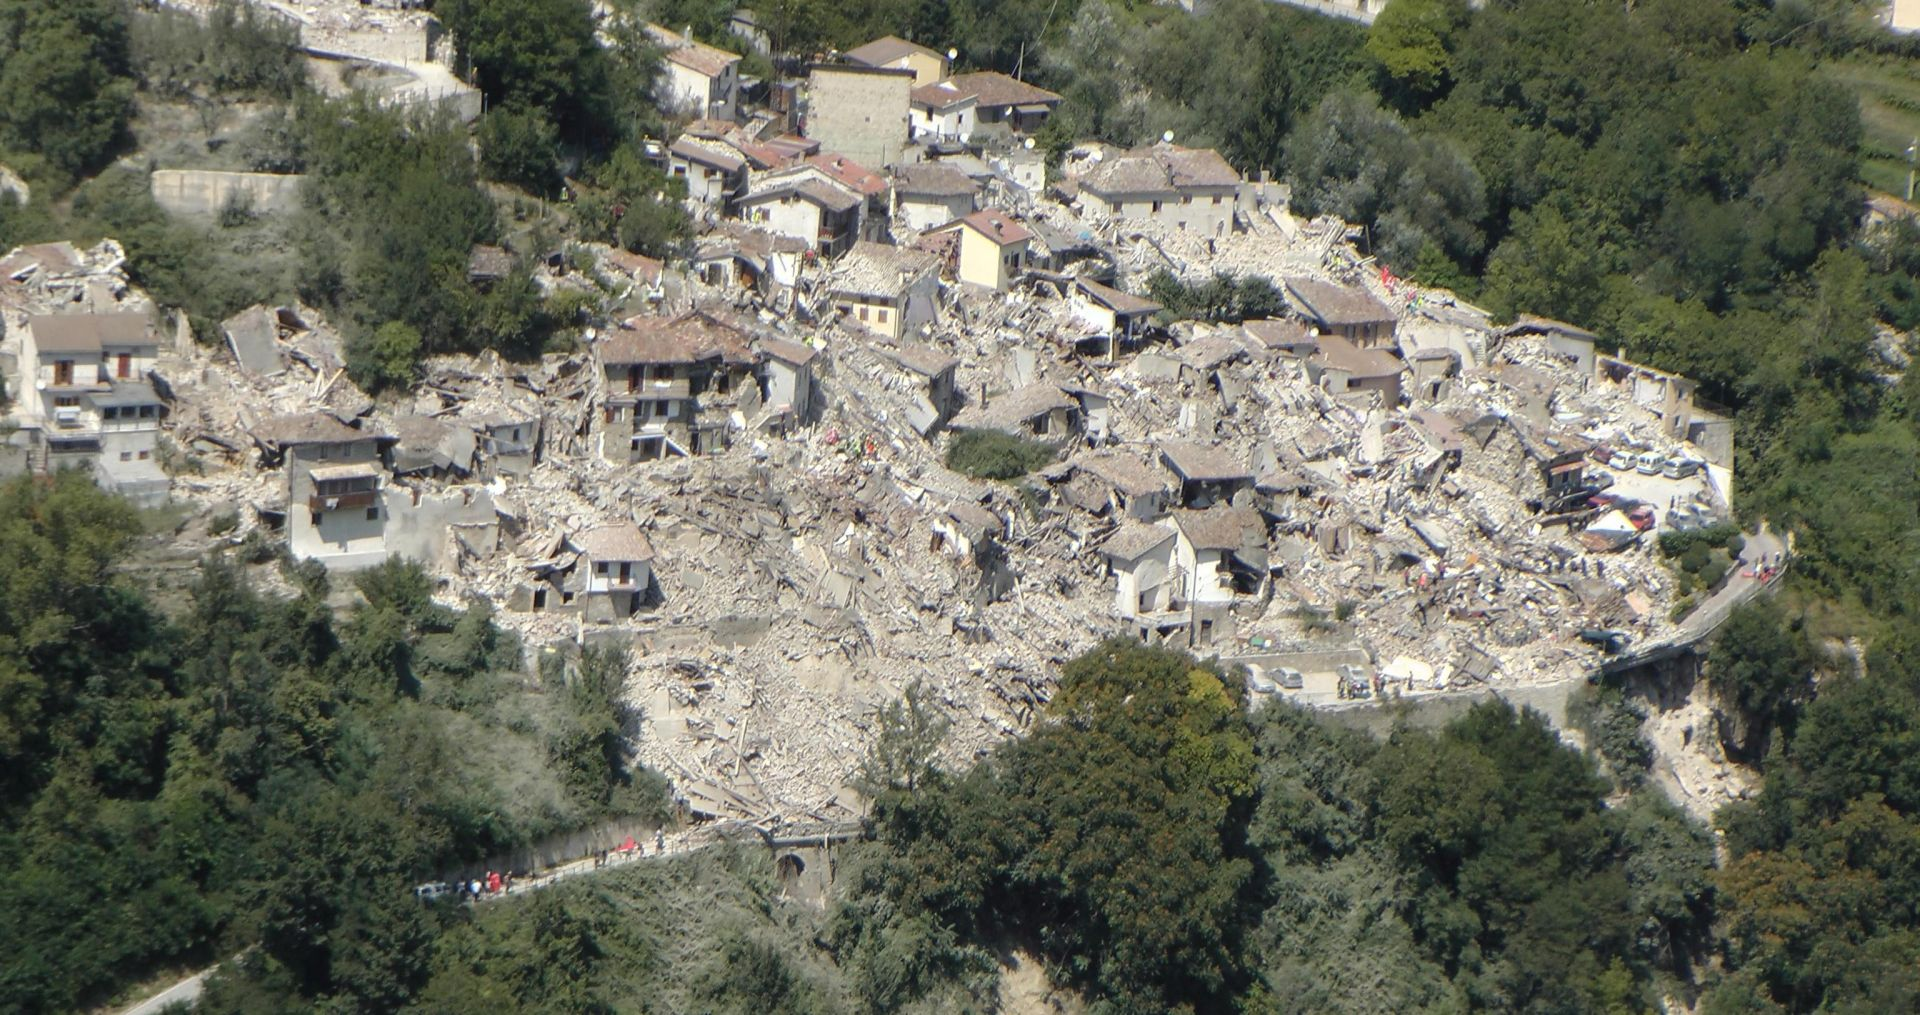 SNAŽAN POTRES U ITALIJI Broj mrtvih porastao na 247, spasilačke službe nastavljaju s potragom za preživjelima